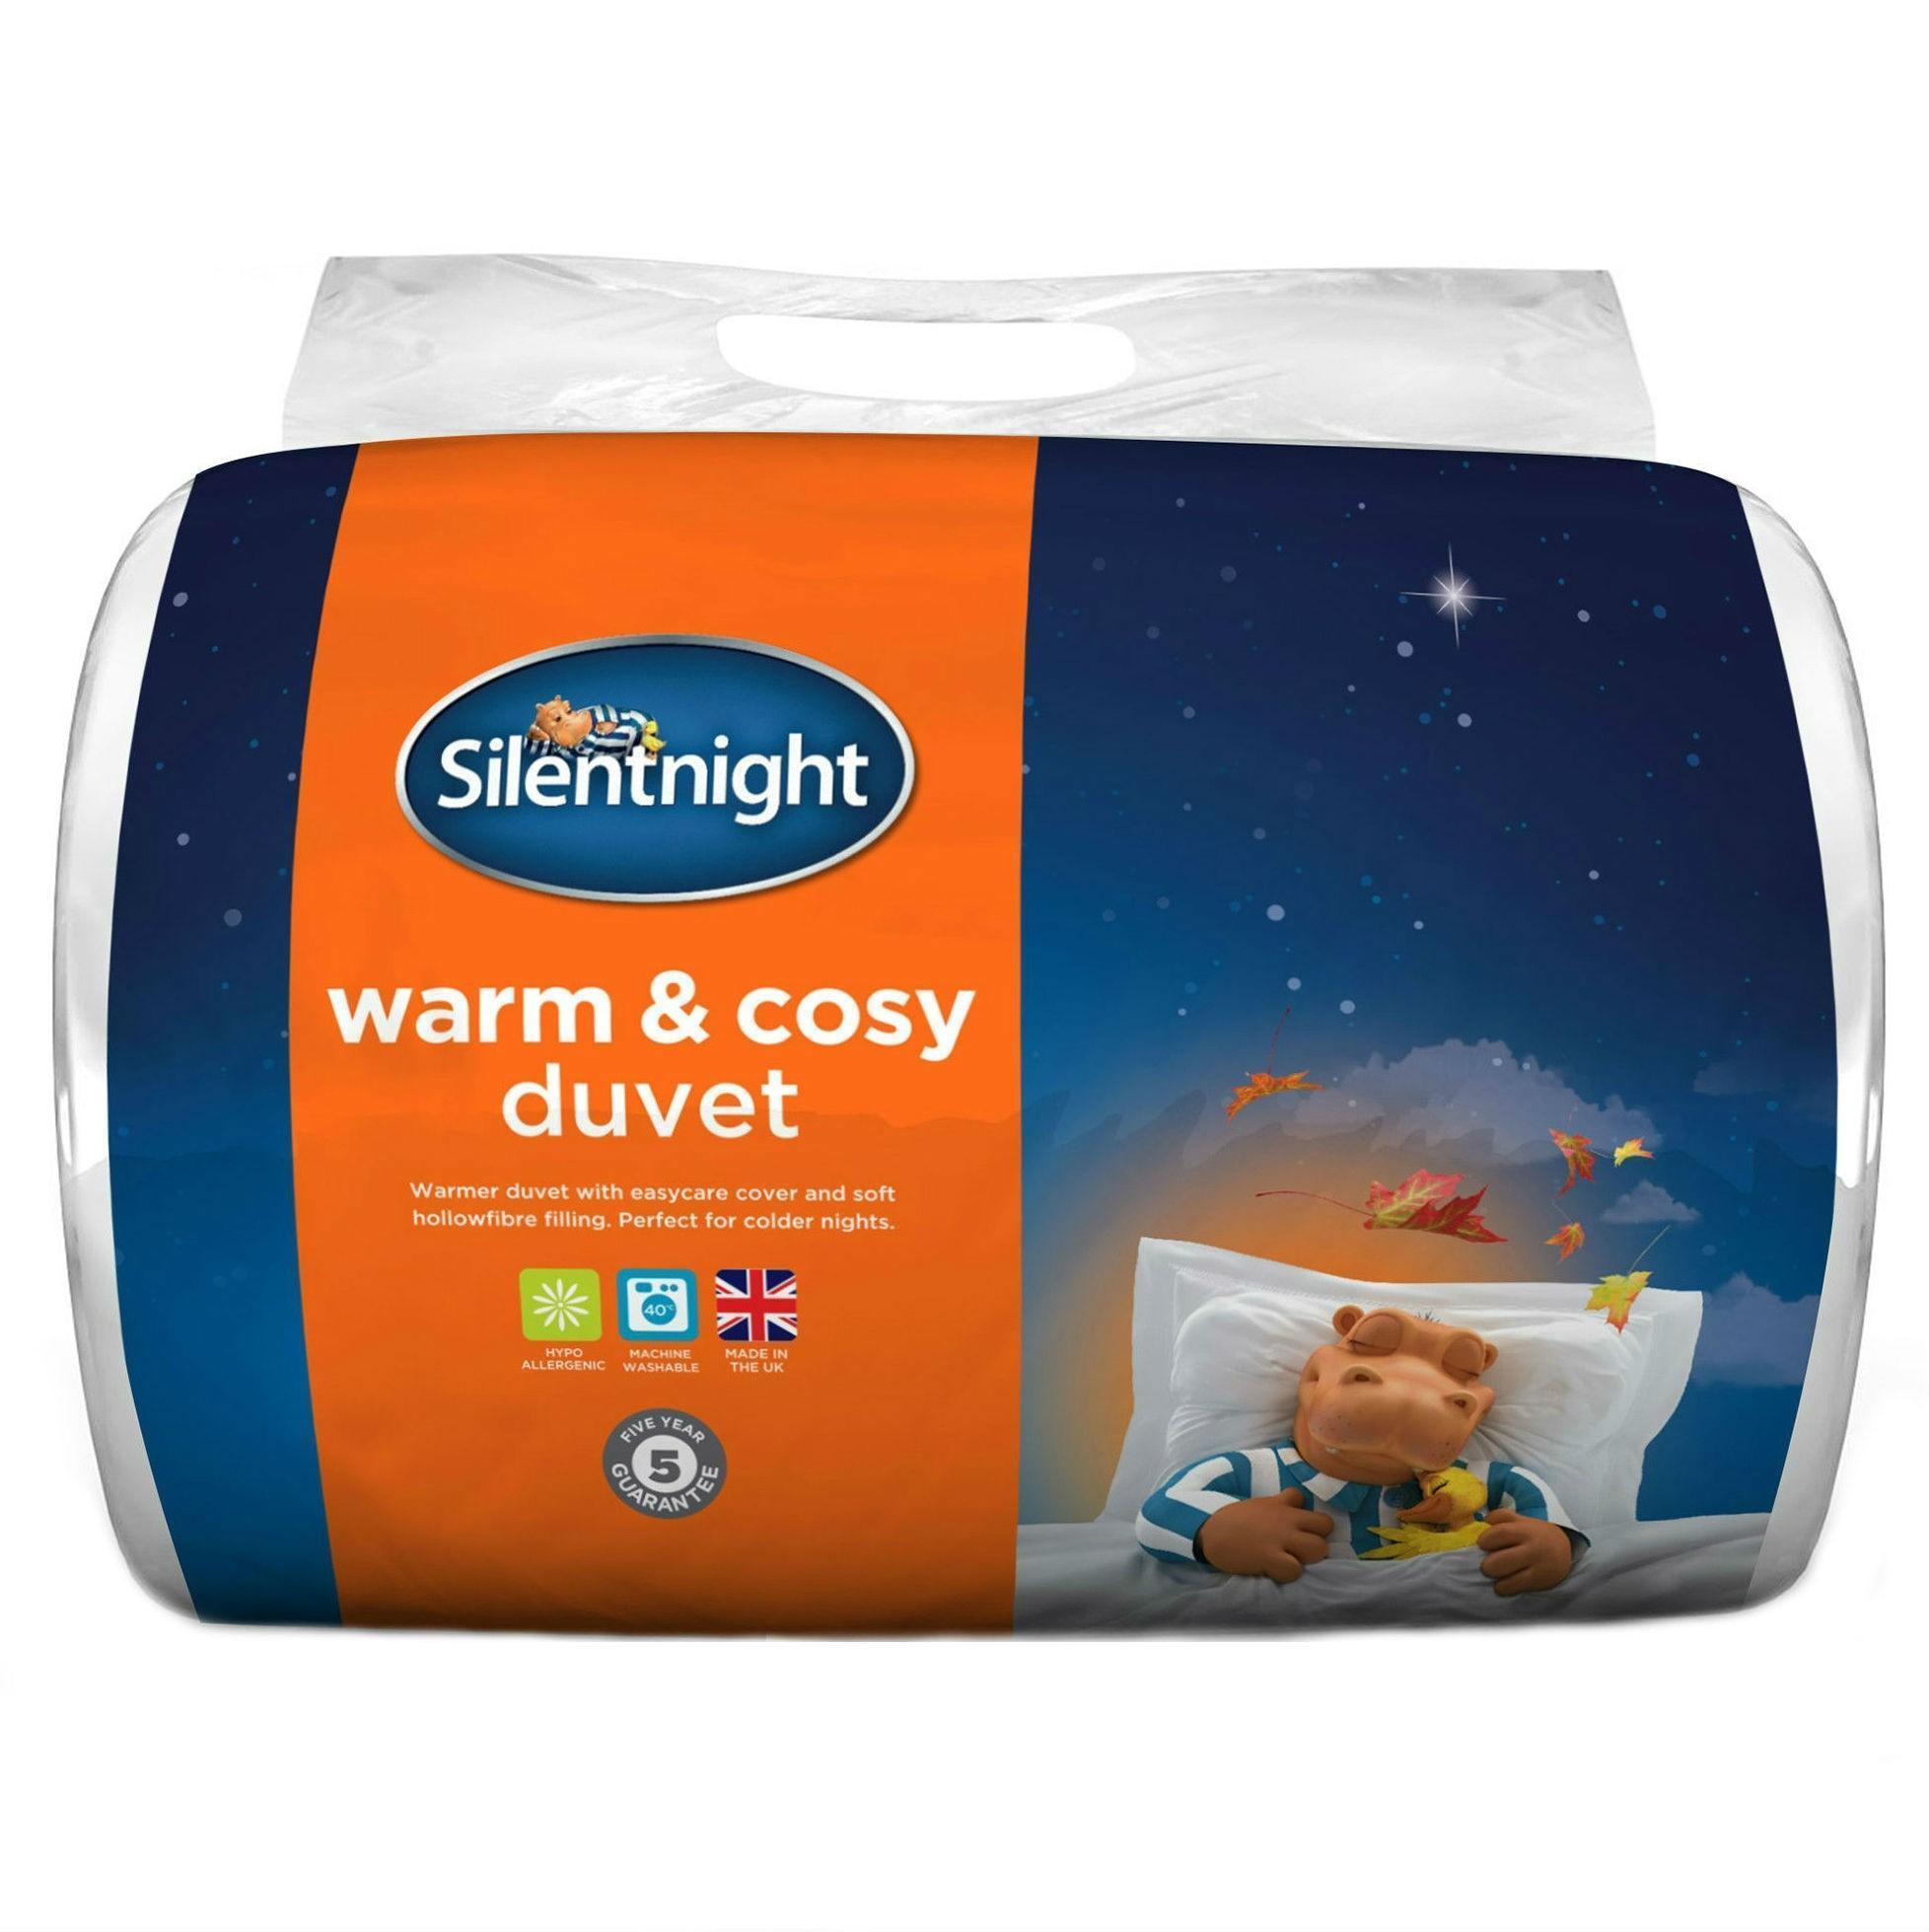 Silentnight Warm And Cosy Duvet 15 Tog Ponden Home